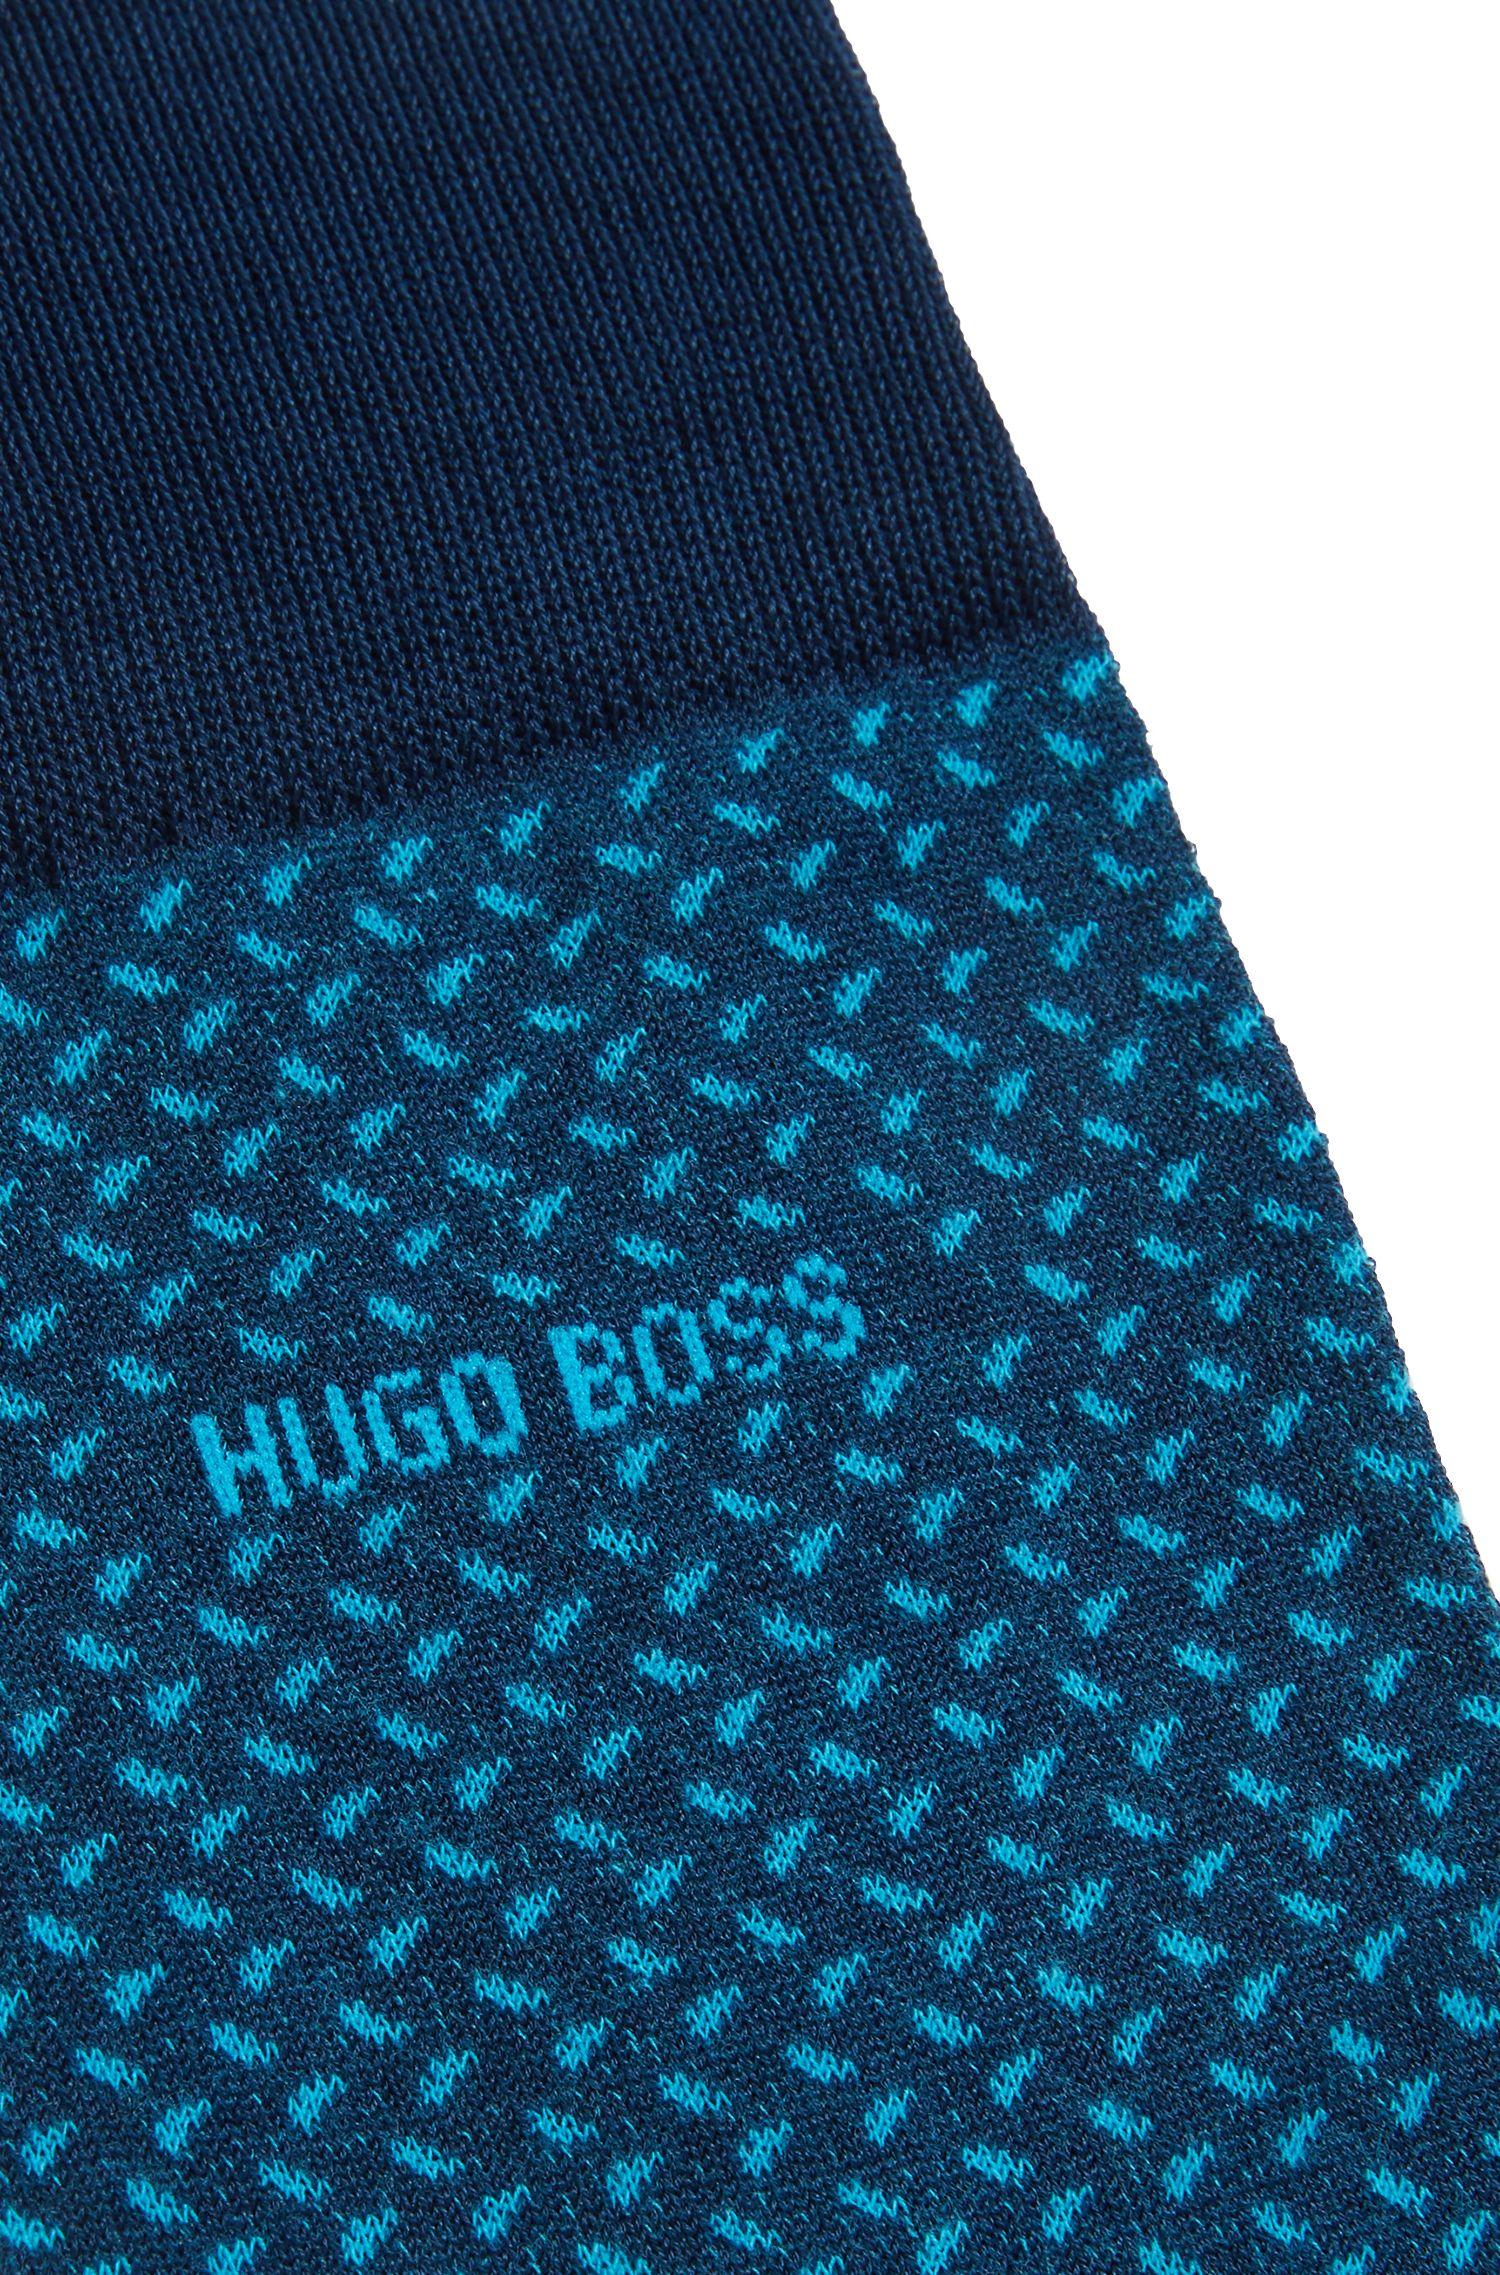 Patterned Cotton Blend Sock | RS MiniPattern US MC, Dark Blue